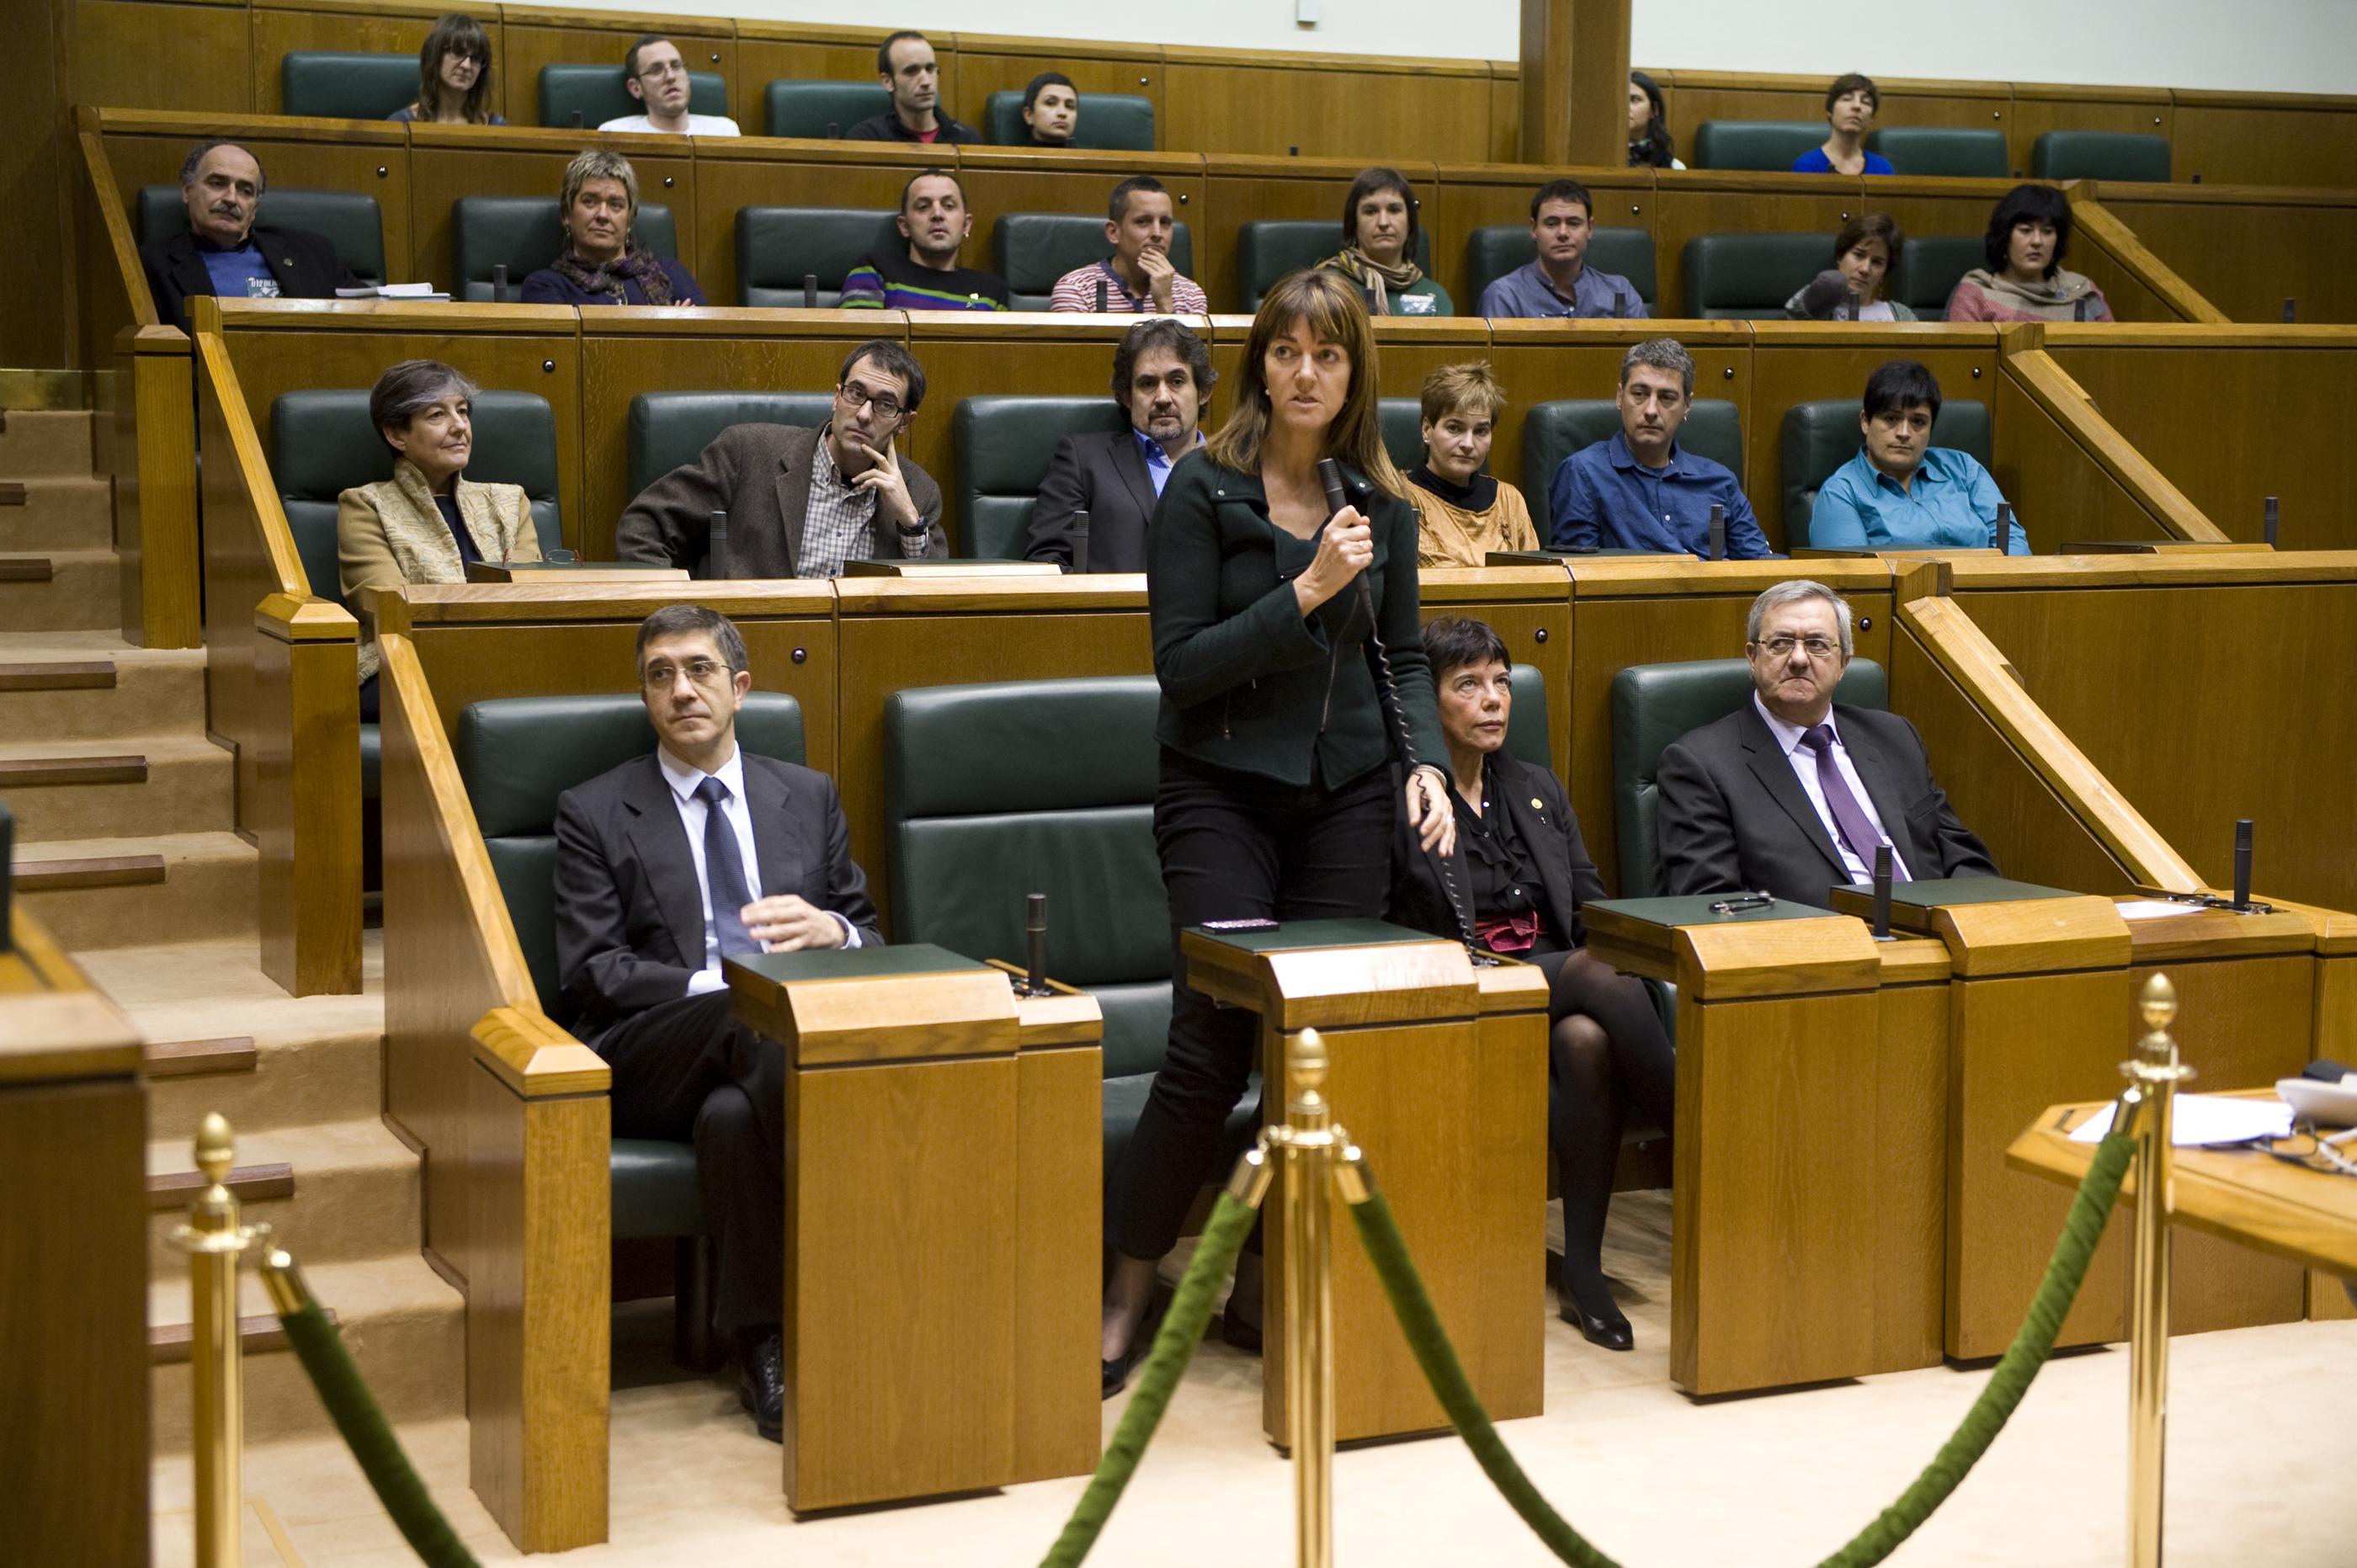 2012_12_13_lehen_parlamento_559.jpg